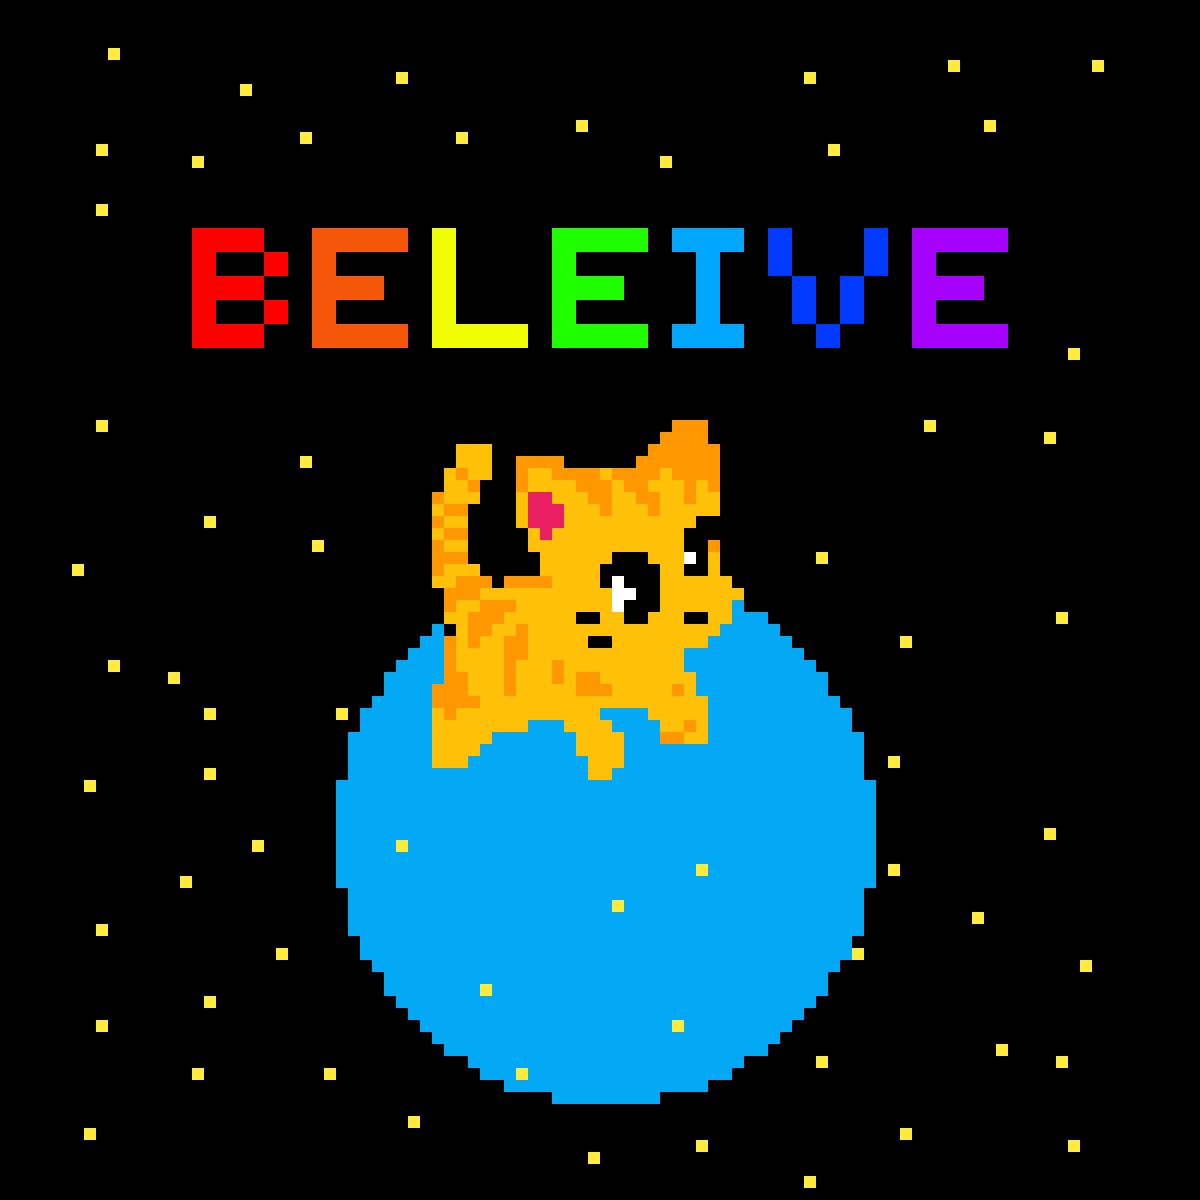 Believe  by uknowitzcasey